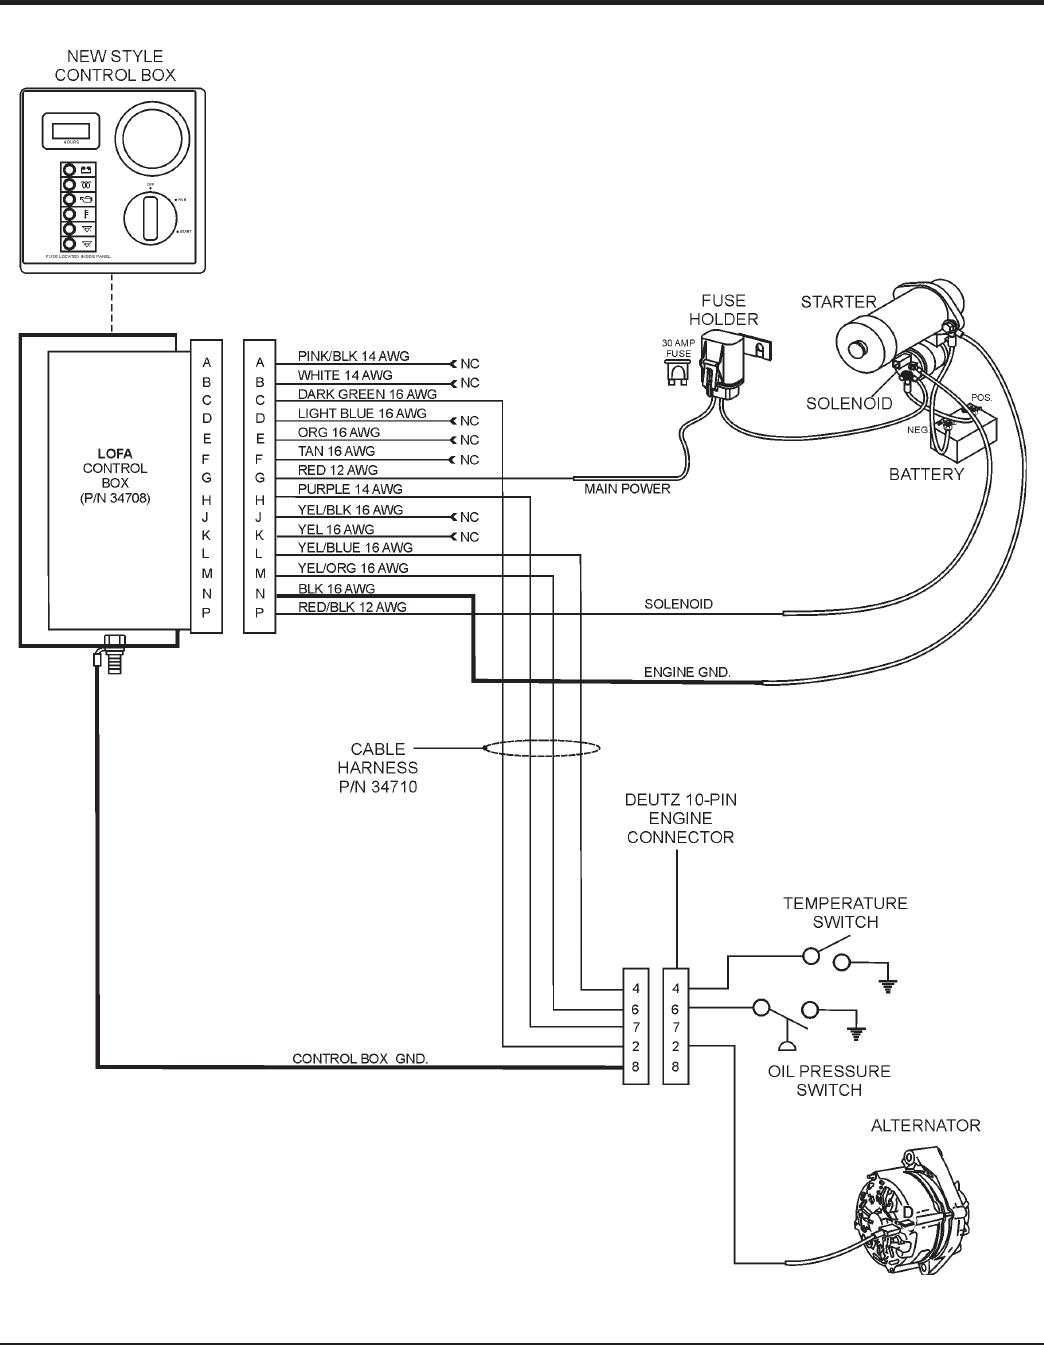 hight resolution of mq62tdd trash pump operation and parts manual rev 0 07 30 09 page 53